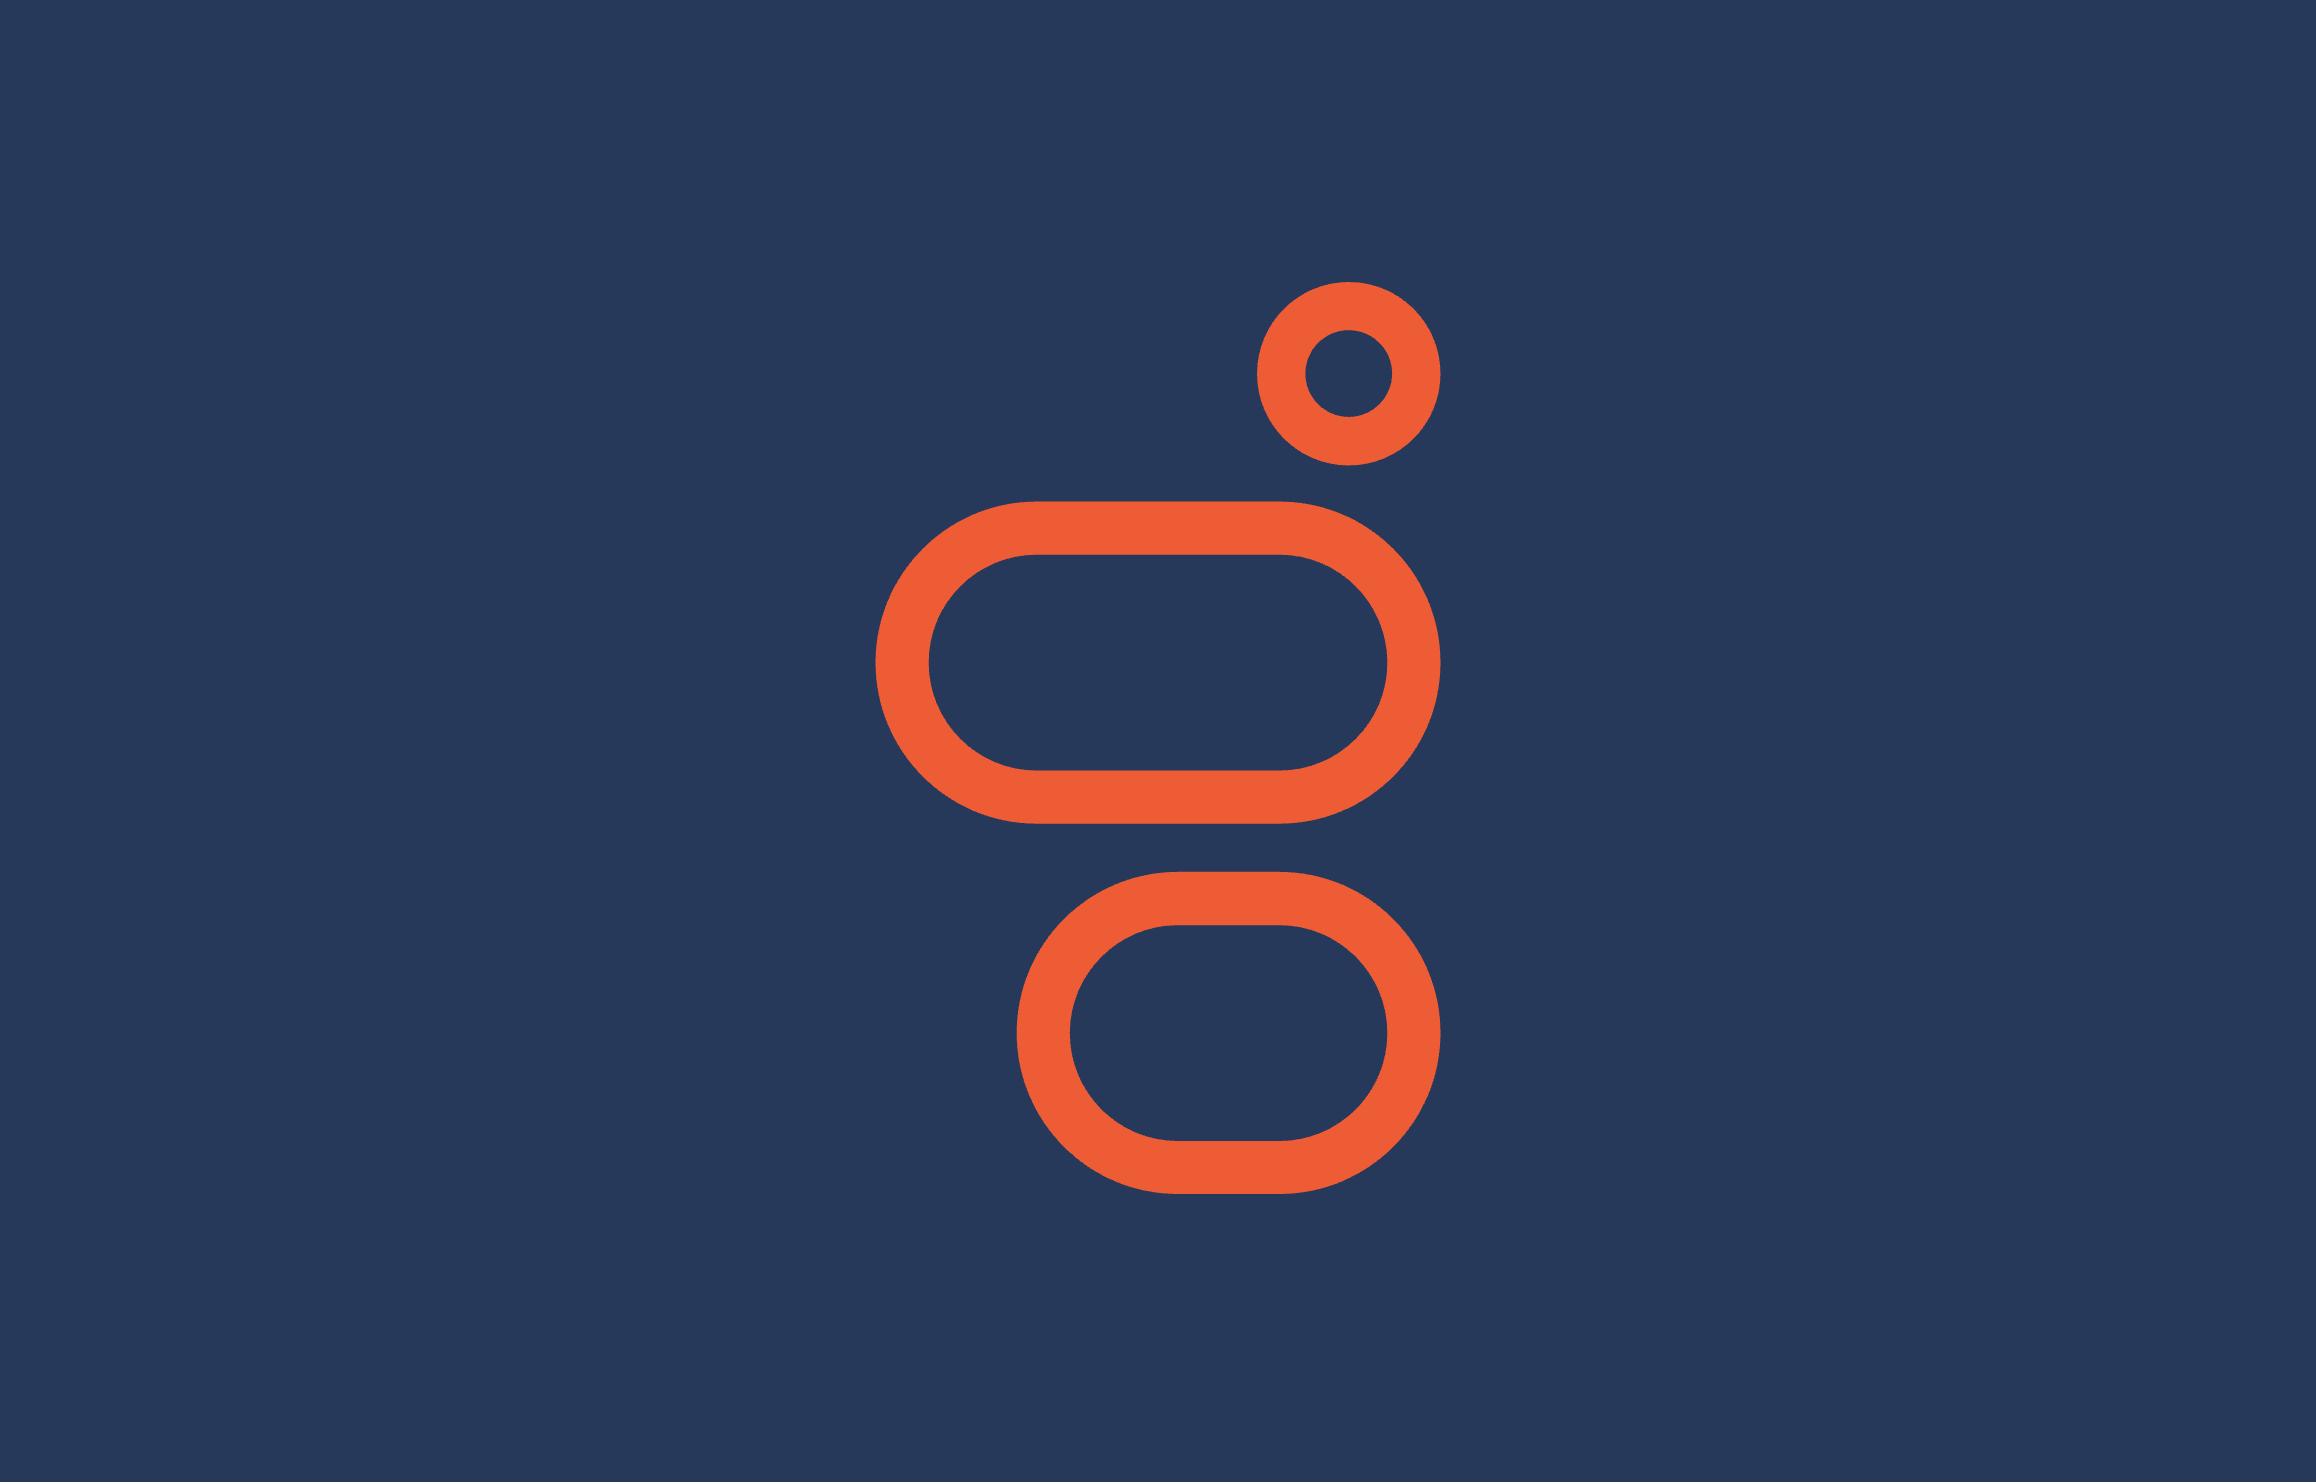 Genesys resource image